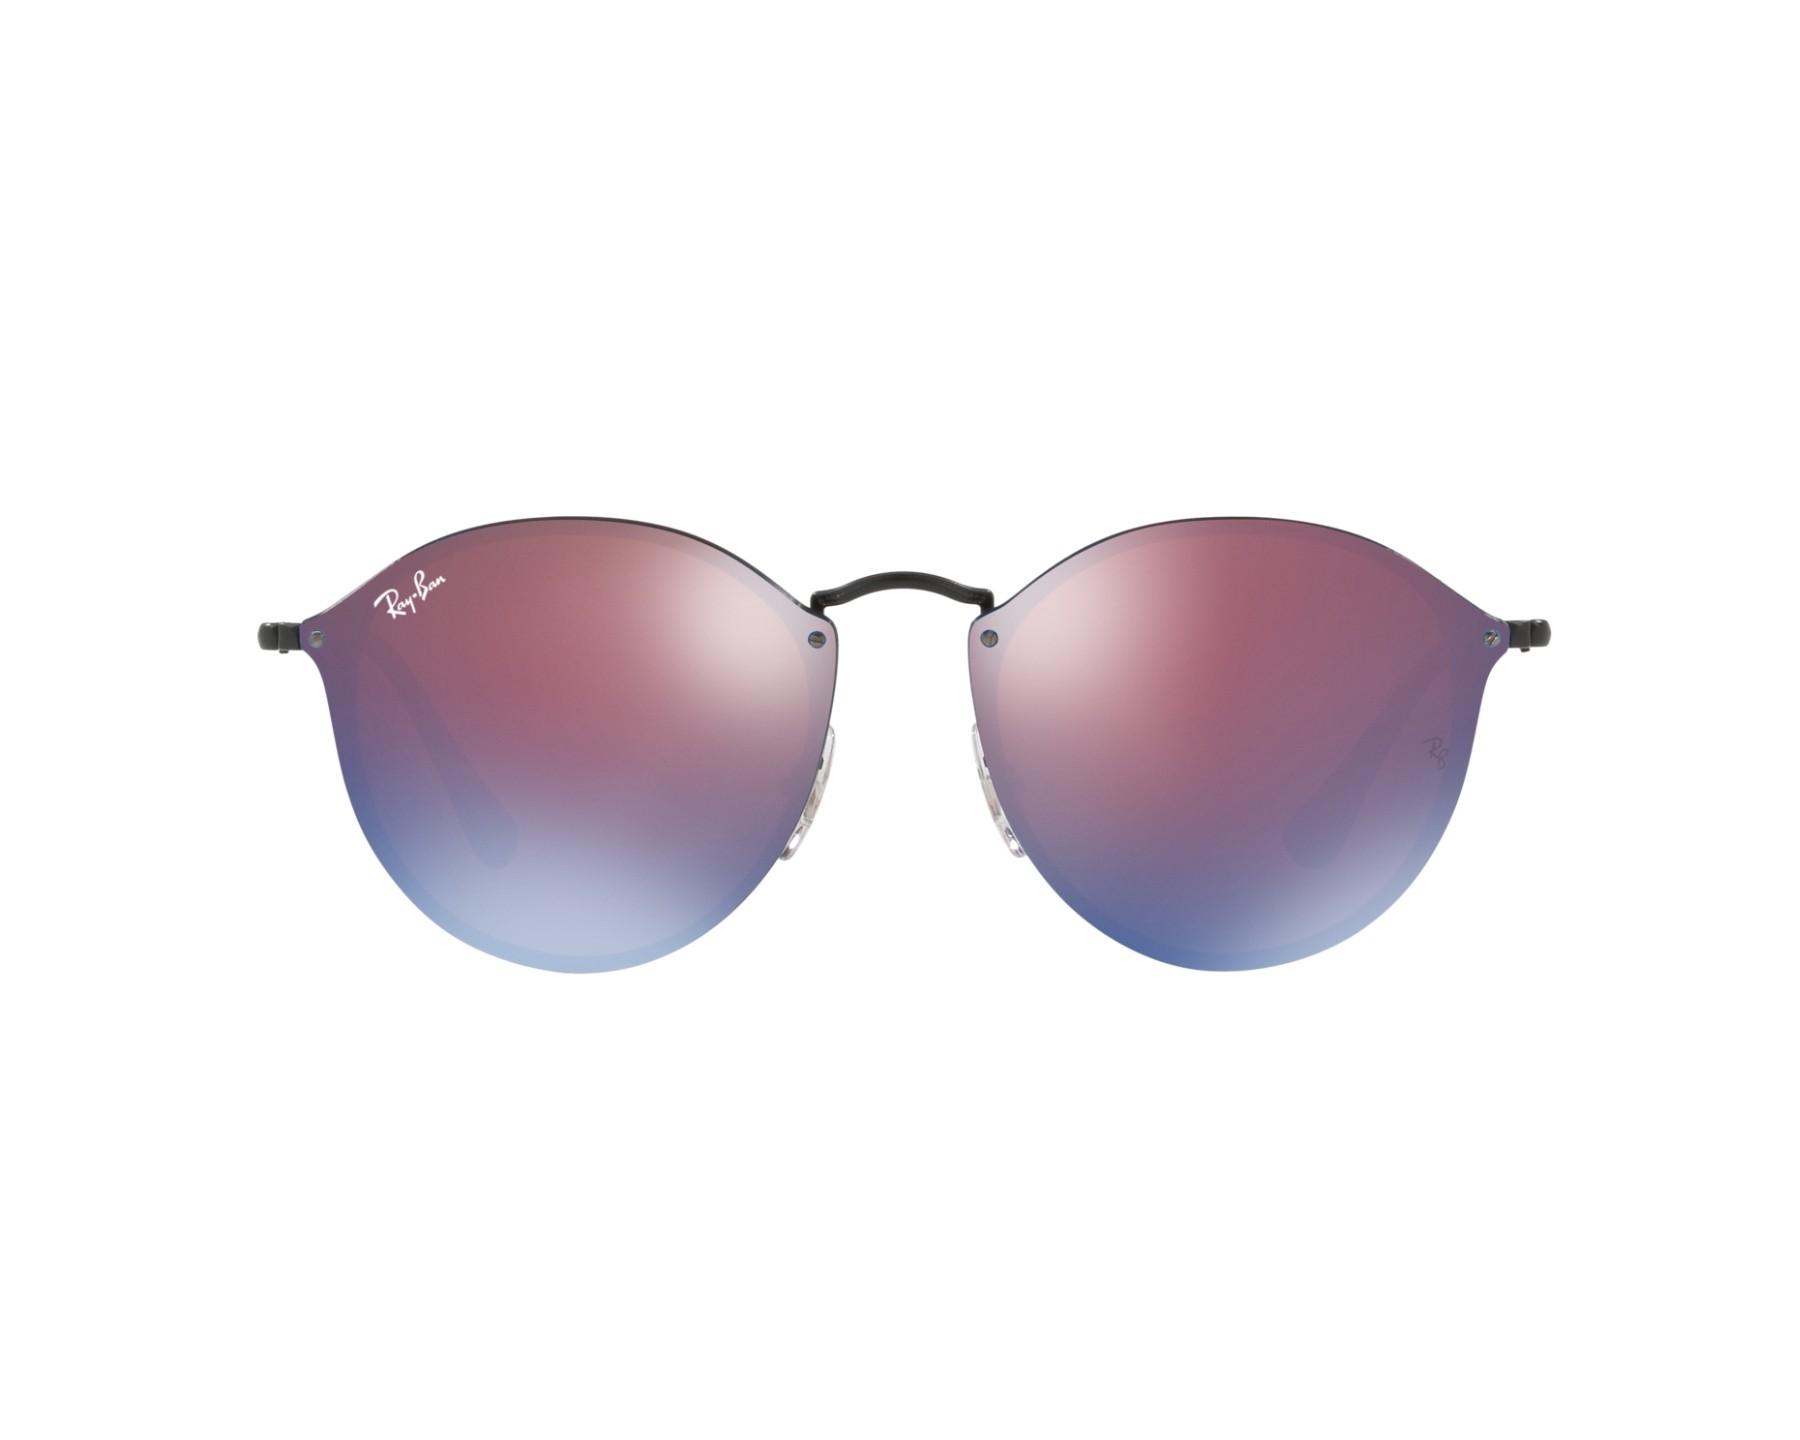 5270c2cb343a9 Sunglasses Ray-Ban RB-3574-N 153 7V 59-14 Black